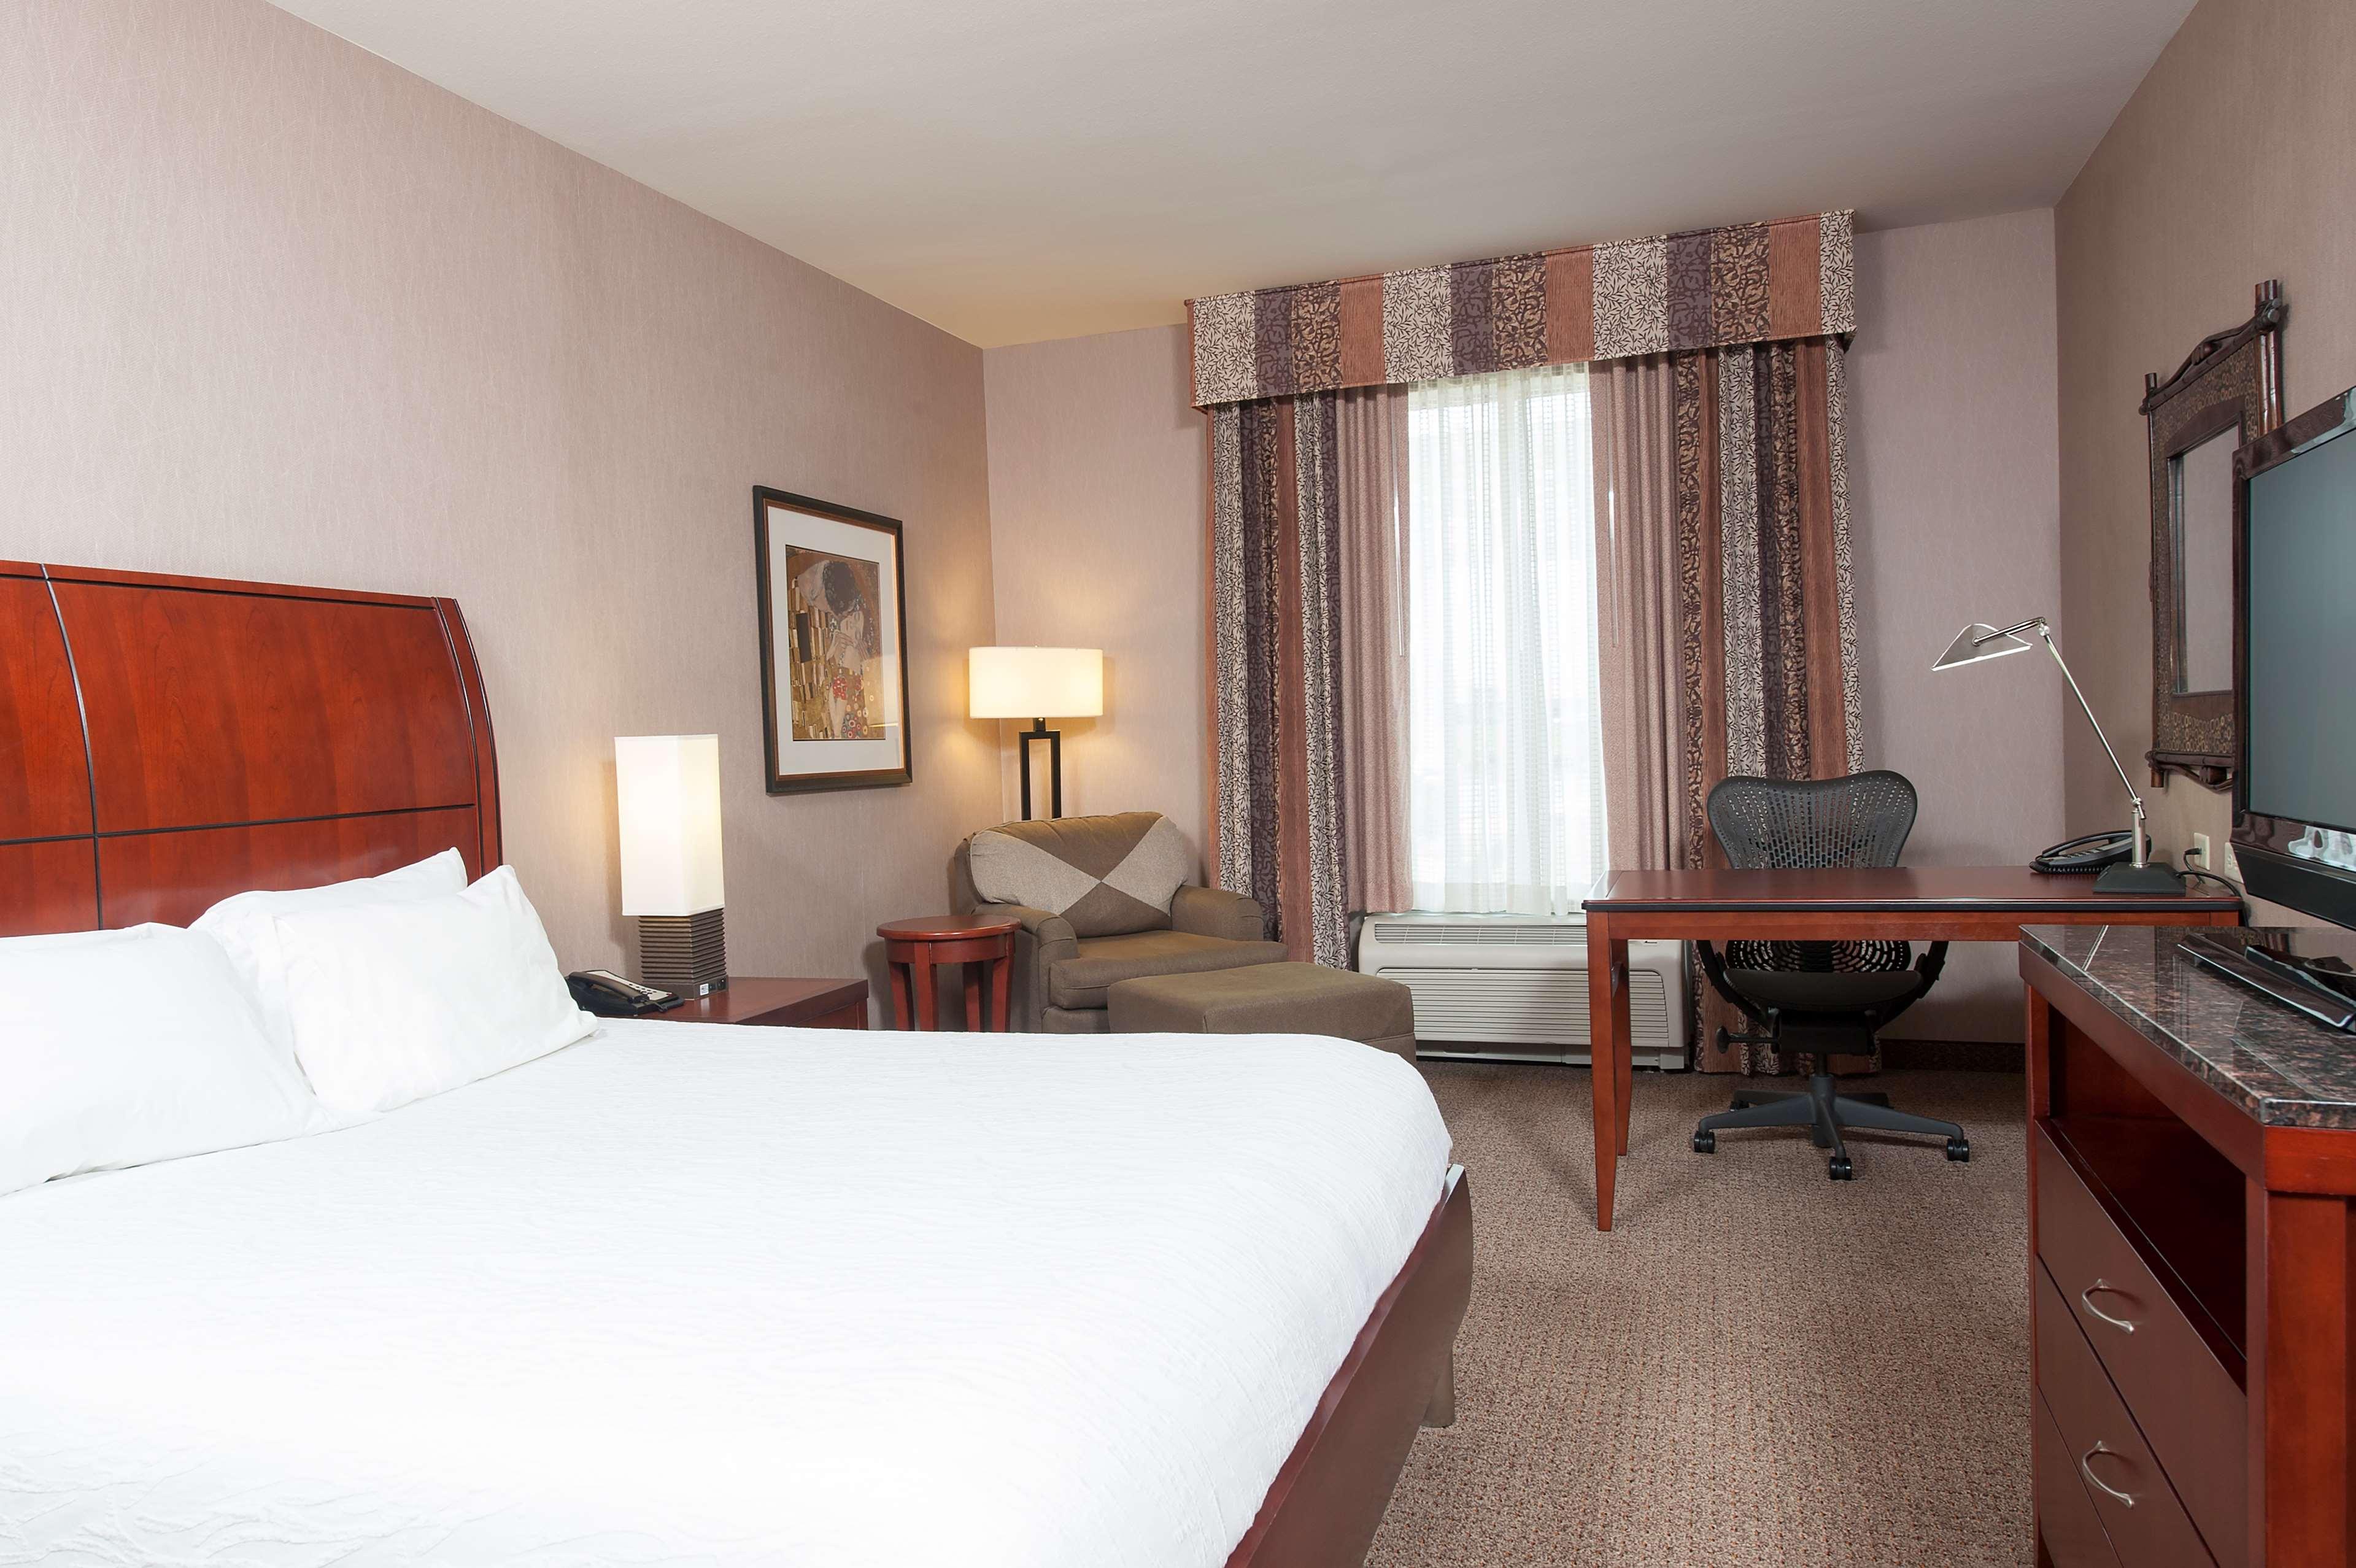 Hilton Garden Inn Indianapolis South/Greenwood image 18